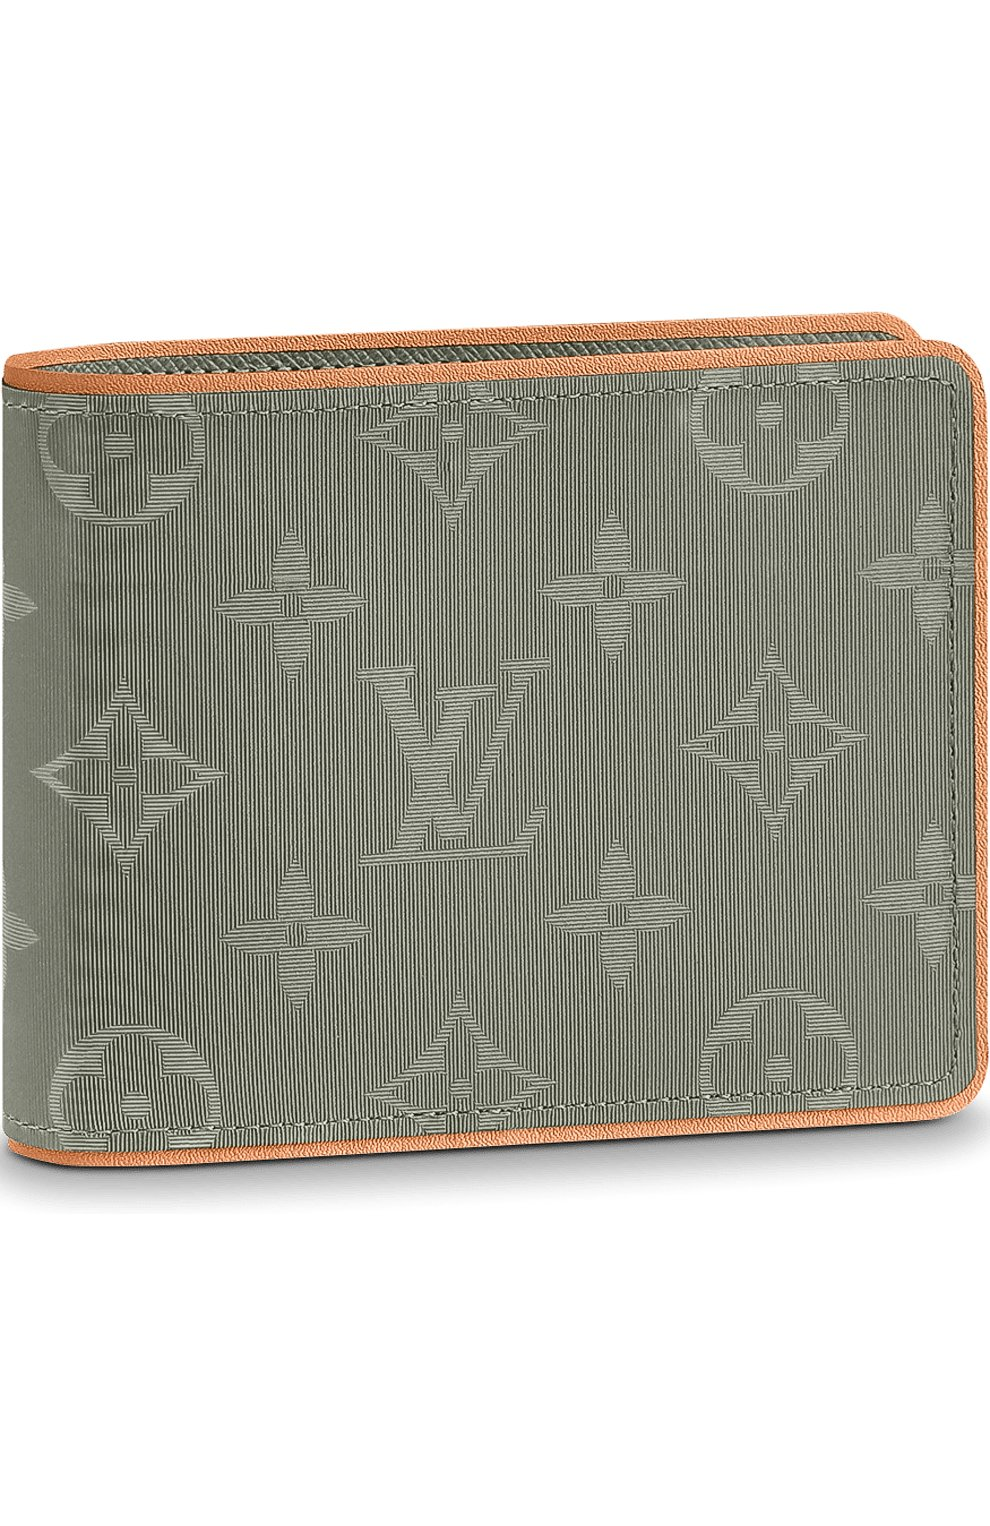 38bf330f5b8c Бумажник Multiple Wallet LOUIS VUITTON серого цвета — купить за ...